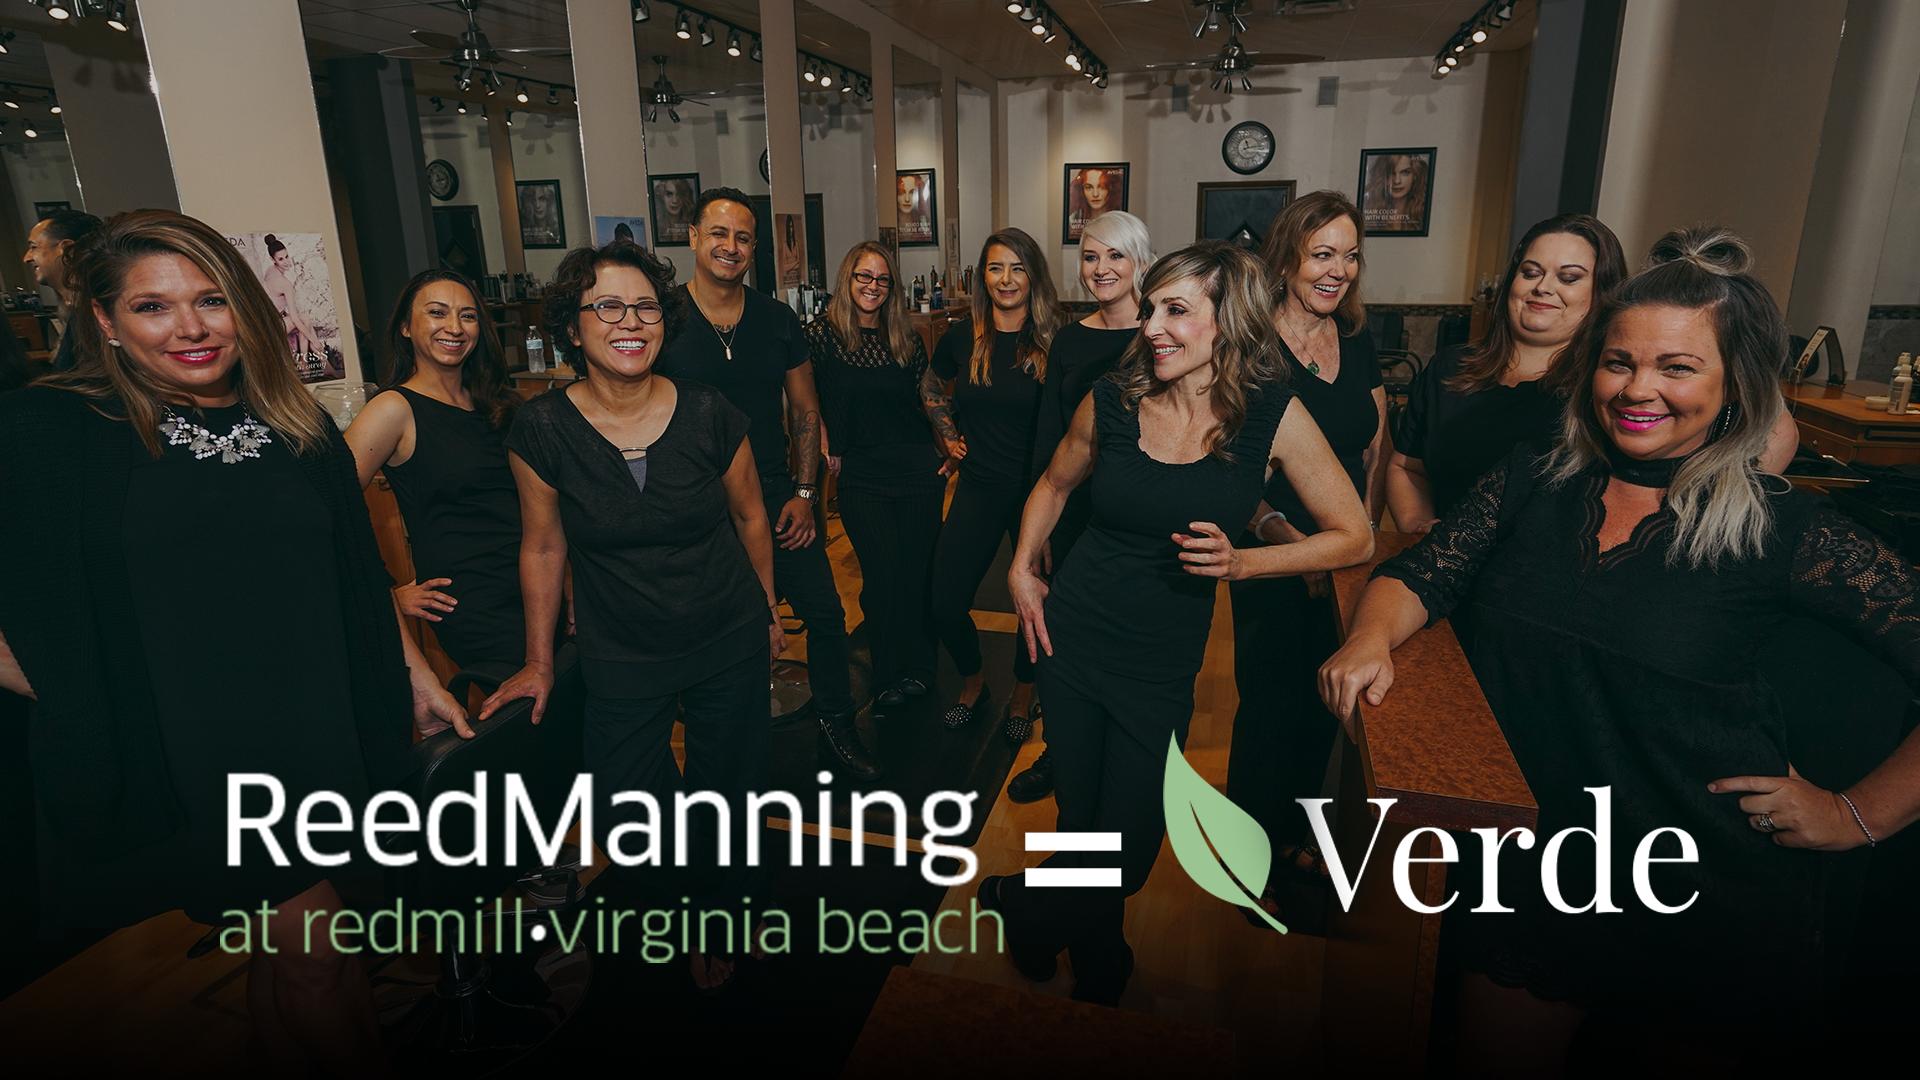 Reed Manning Virginia Beach